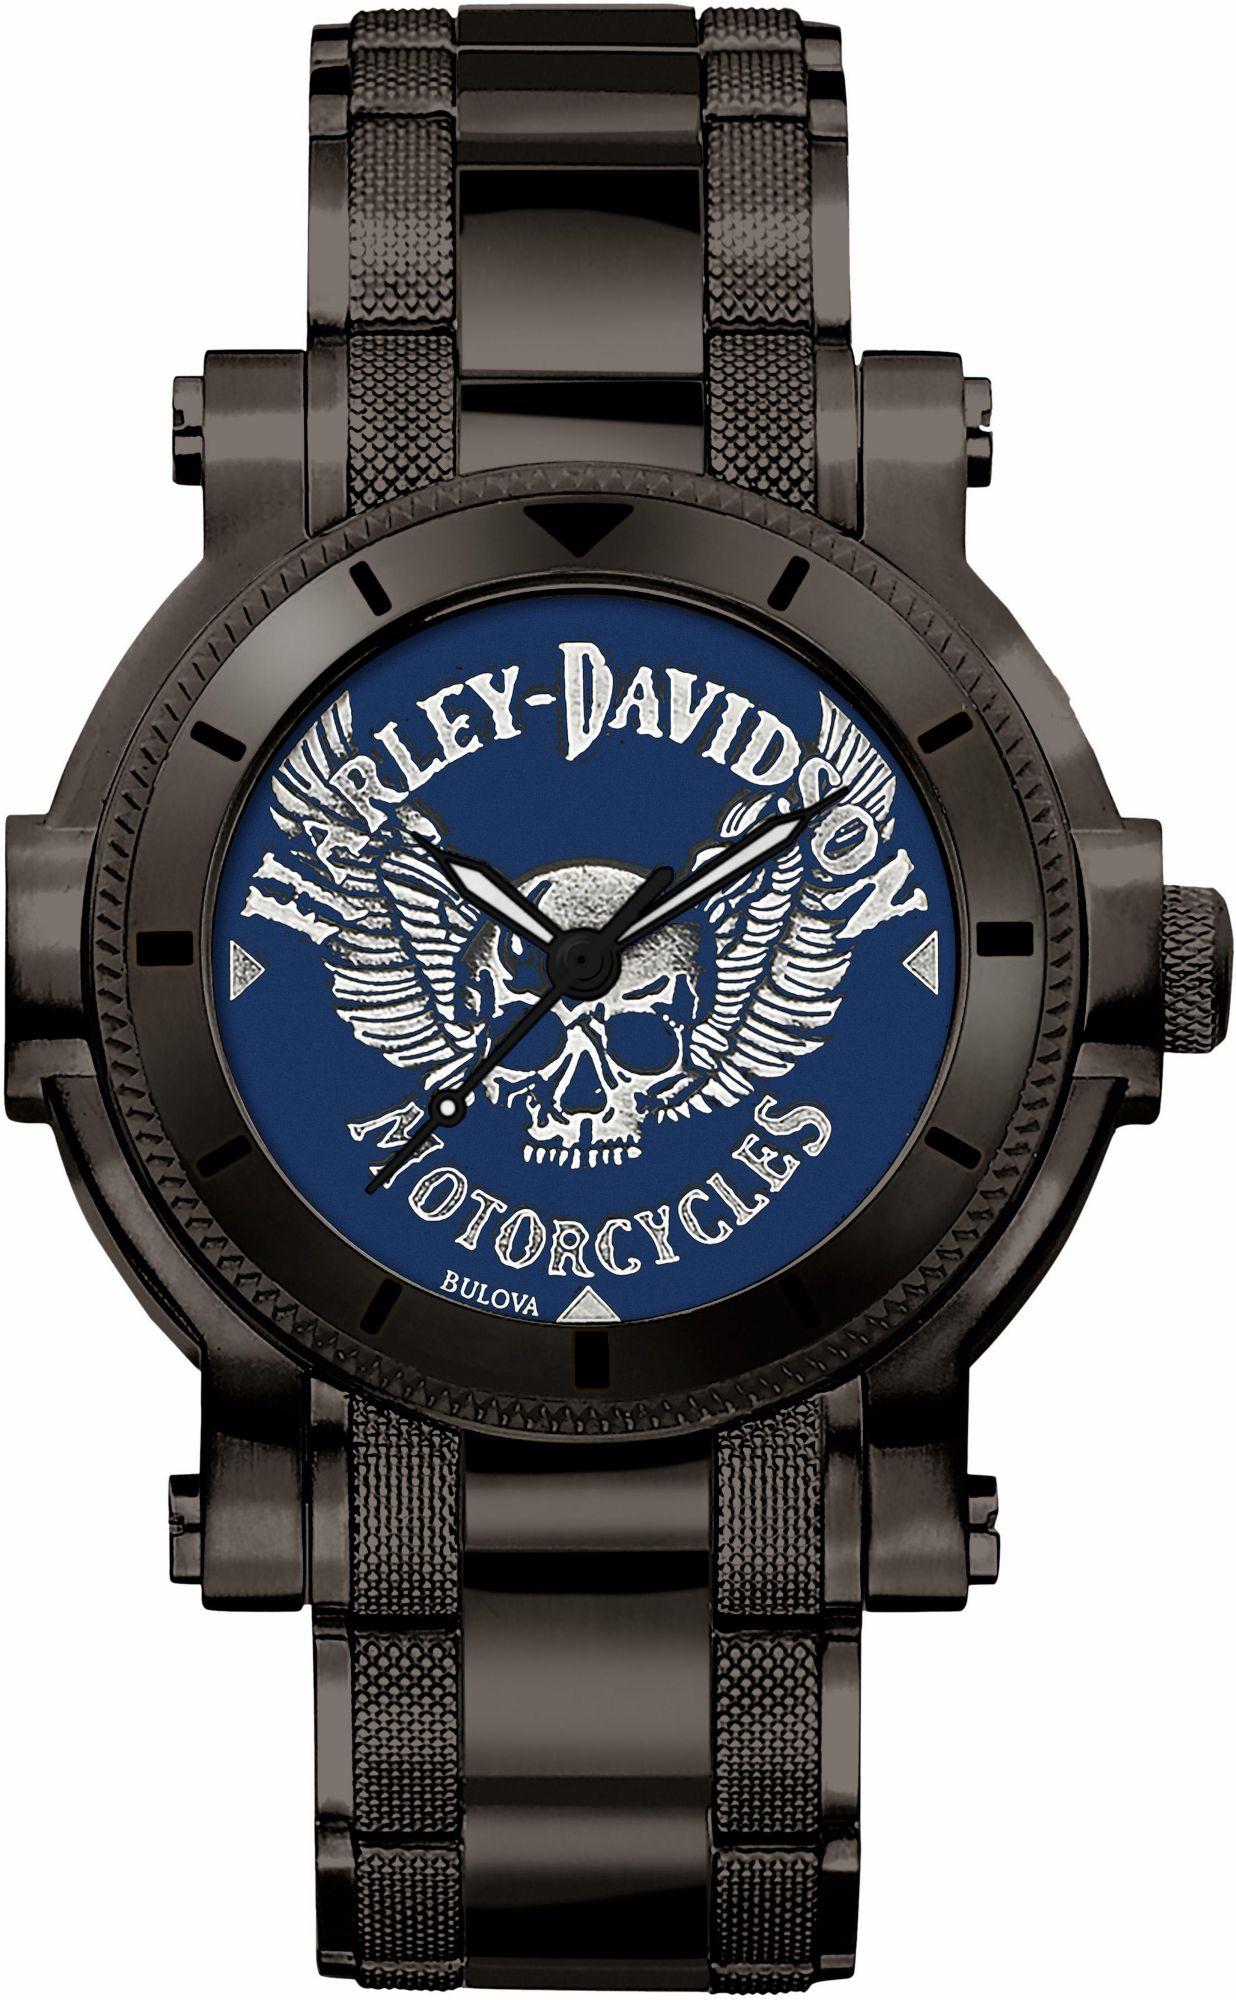 HARLEY DAVIDSON Harley Davidson Quarzuhr »Medallion Dial, 78A117«